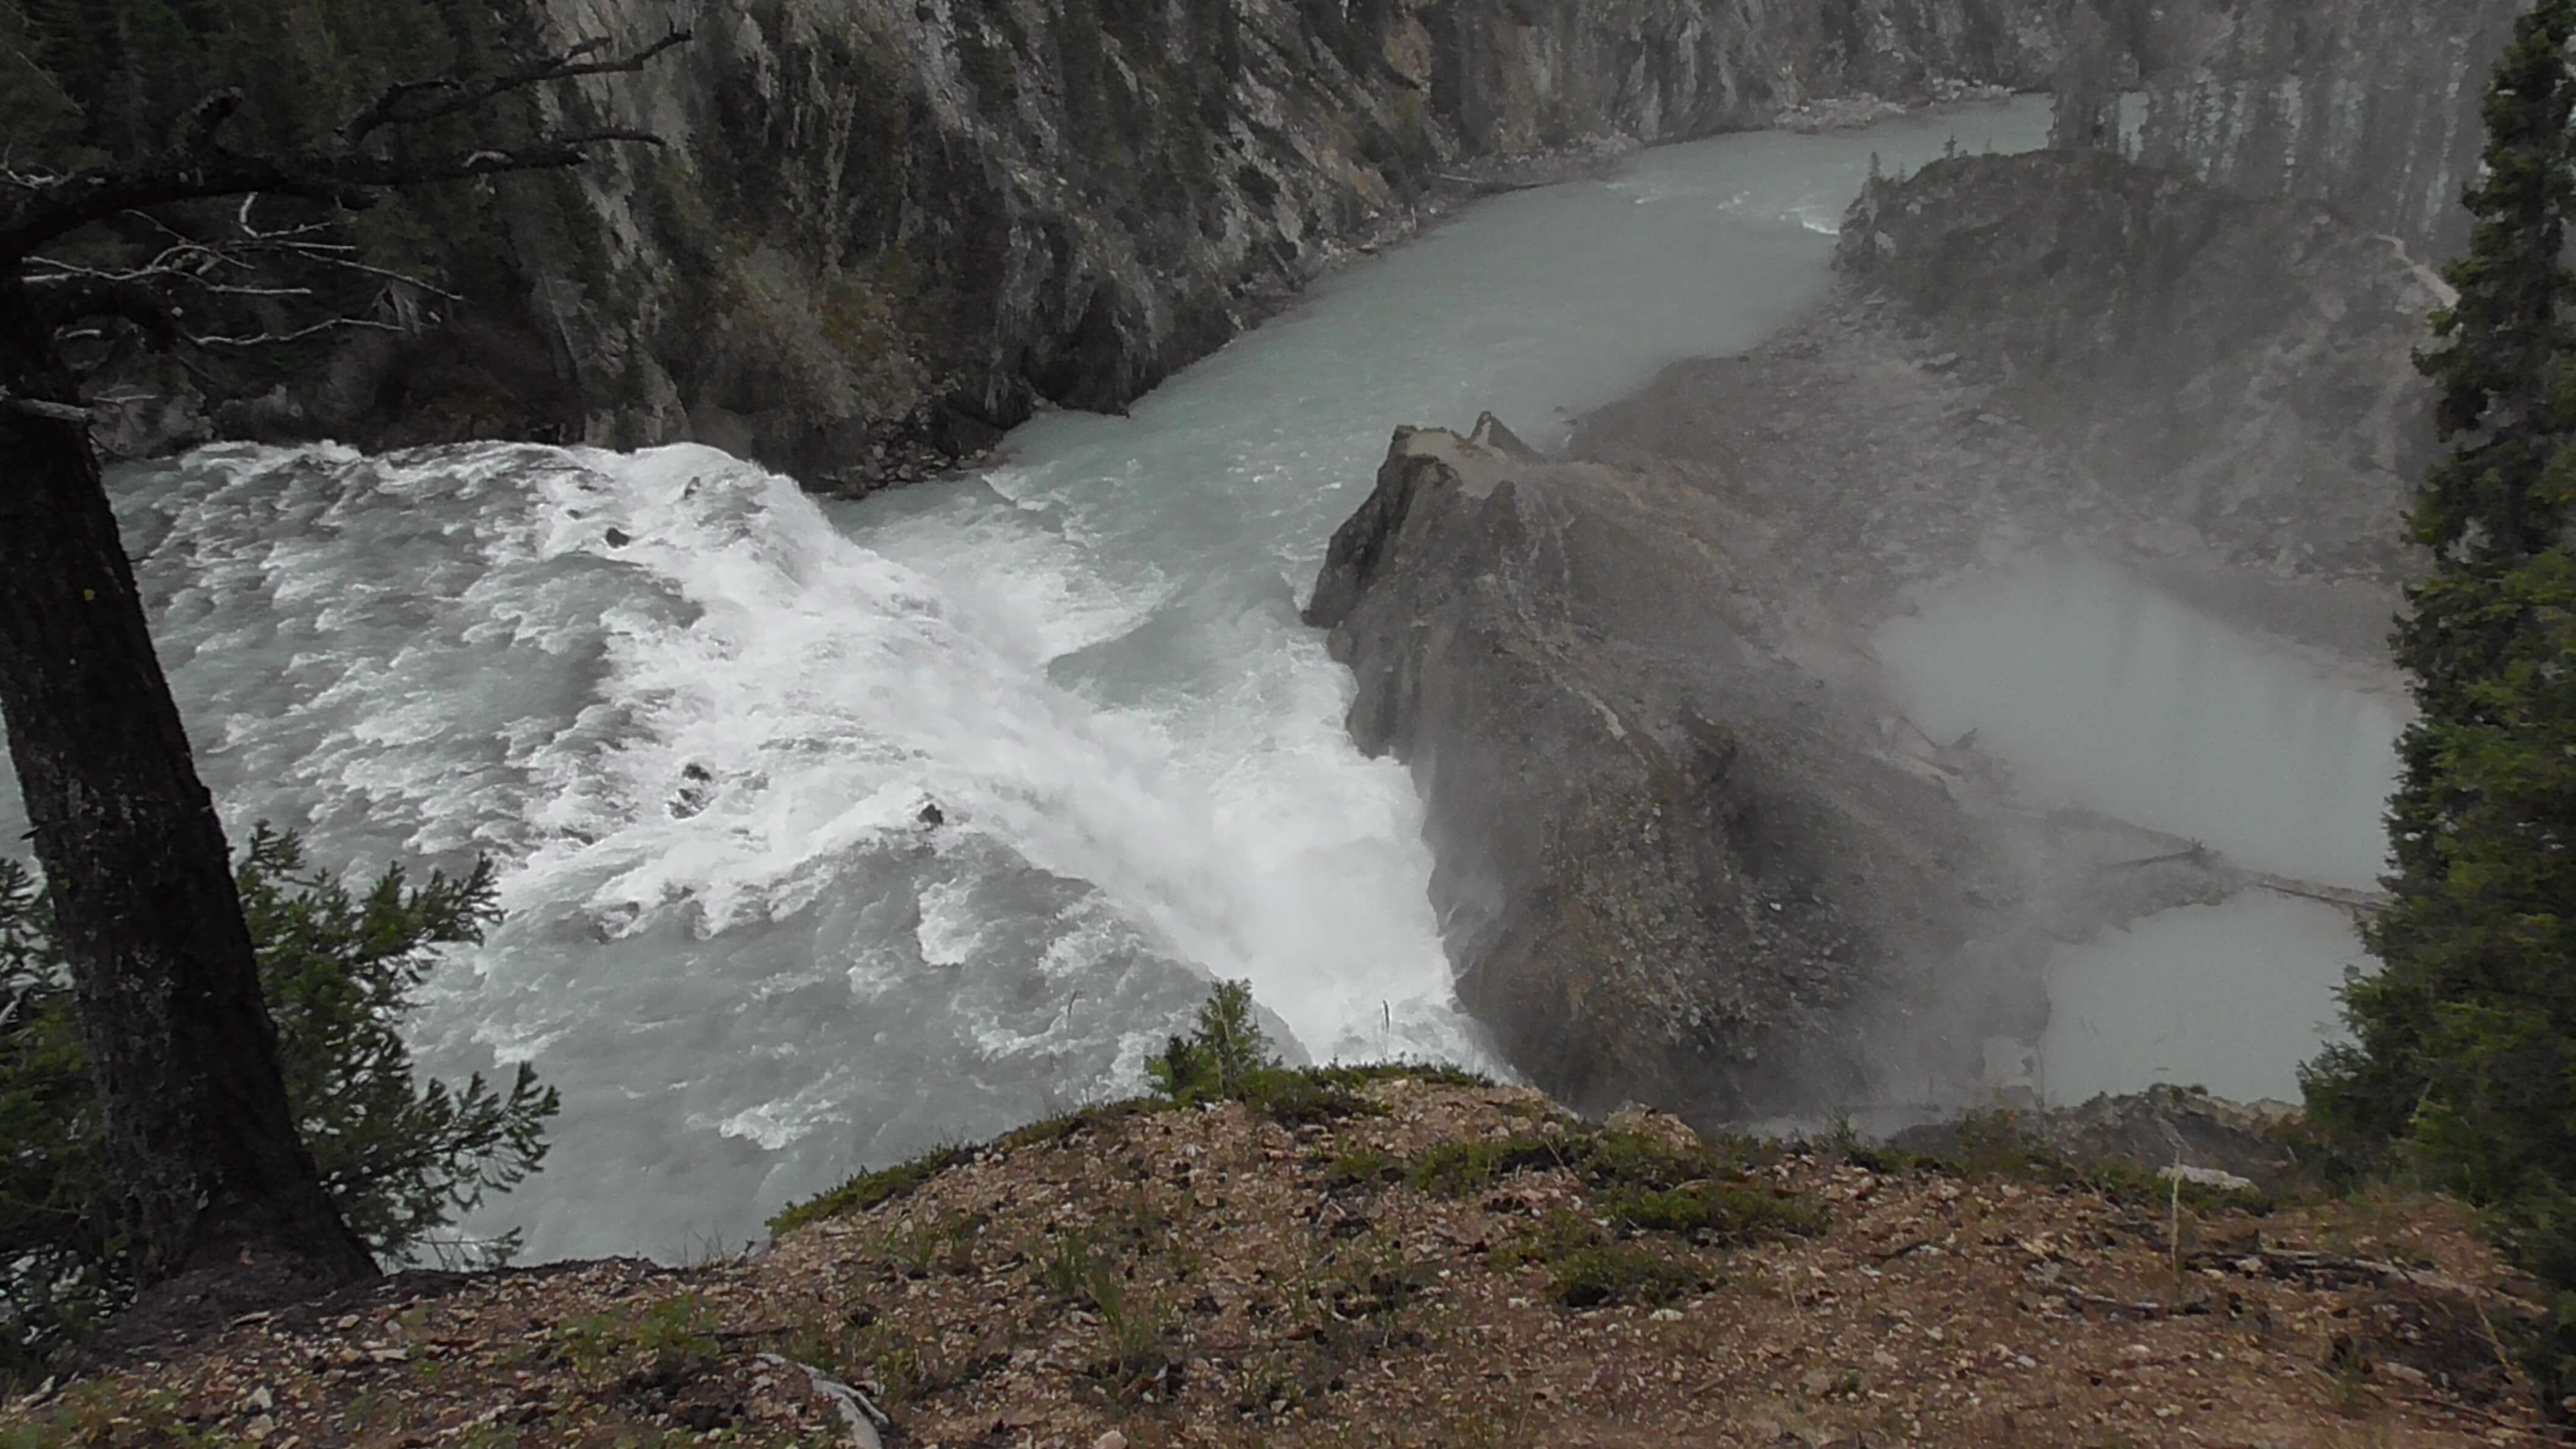 Wapta Falls, Yoho National Park, British Columbia